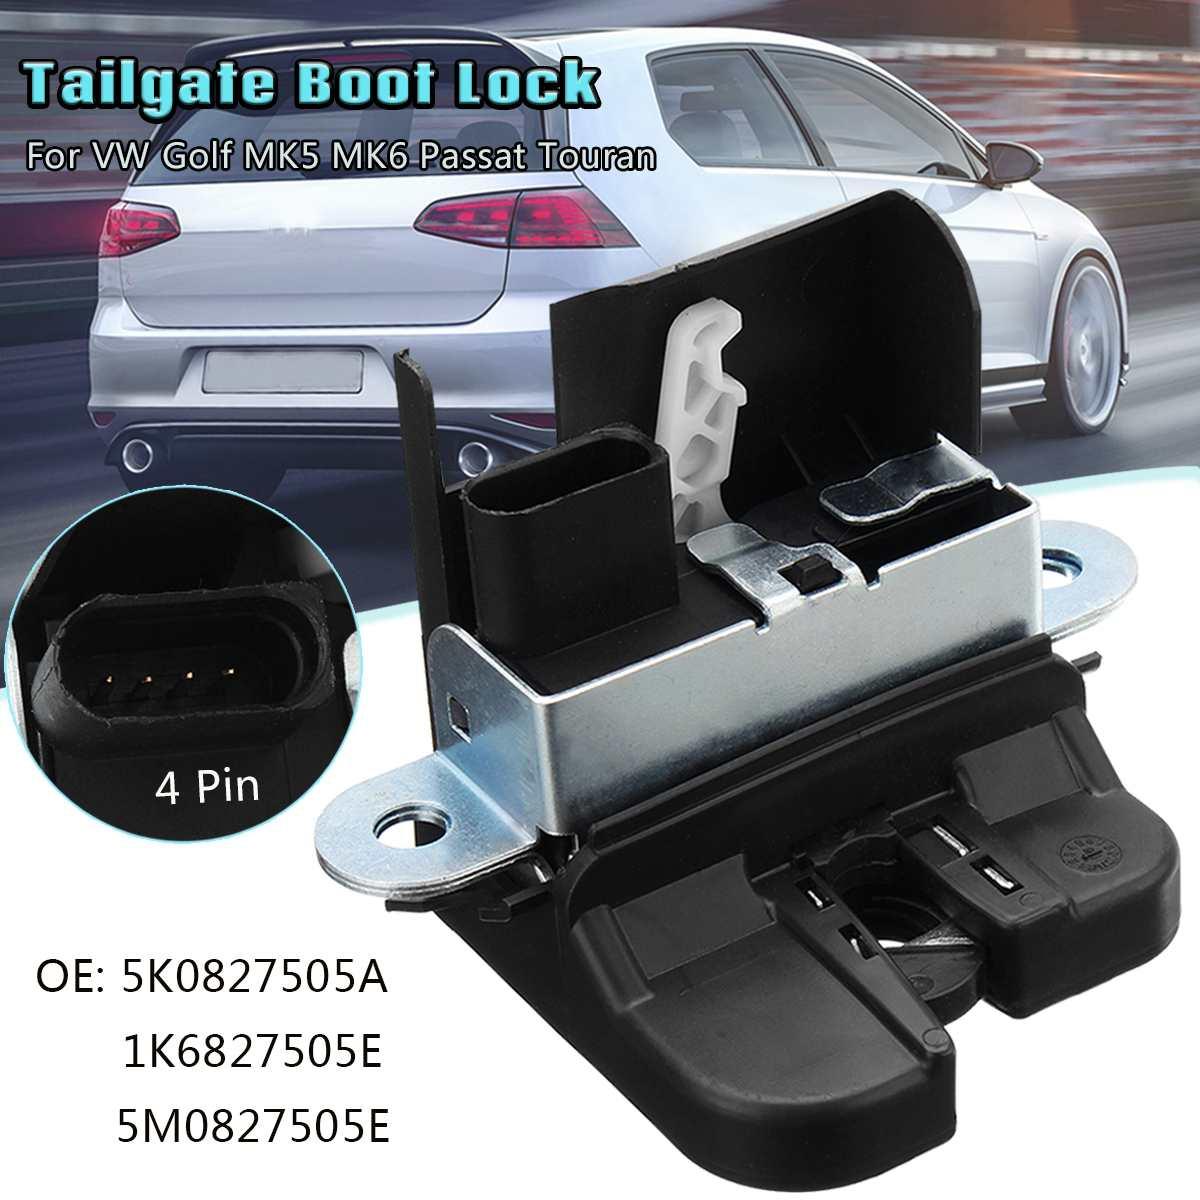 5K0827505A 1K6827505E 5M0827505E Tailgate Boot Lock For VW Golf MK5 MK6 Passat Touran REAR TRUNK LOCK LID LOCK LATCH